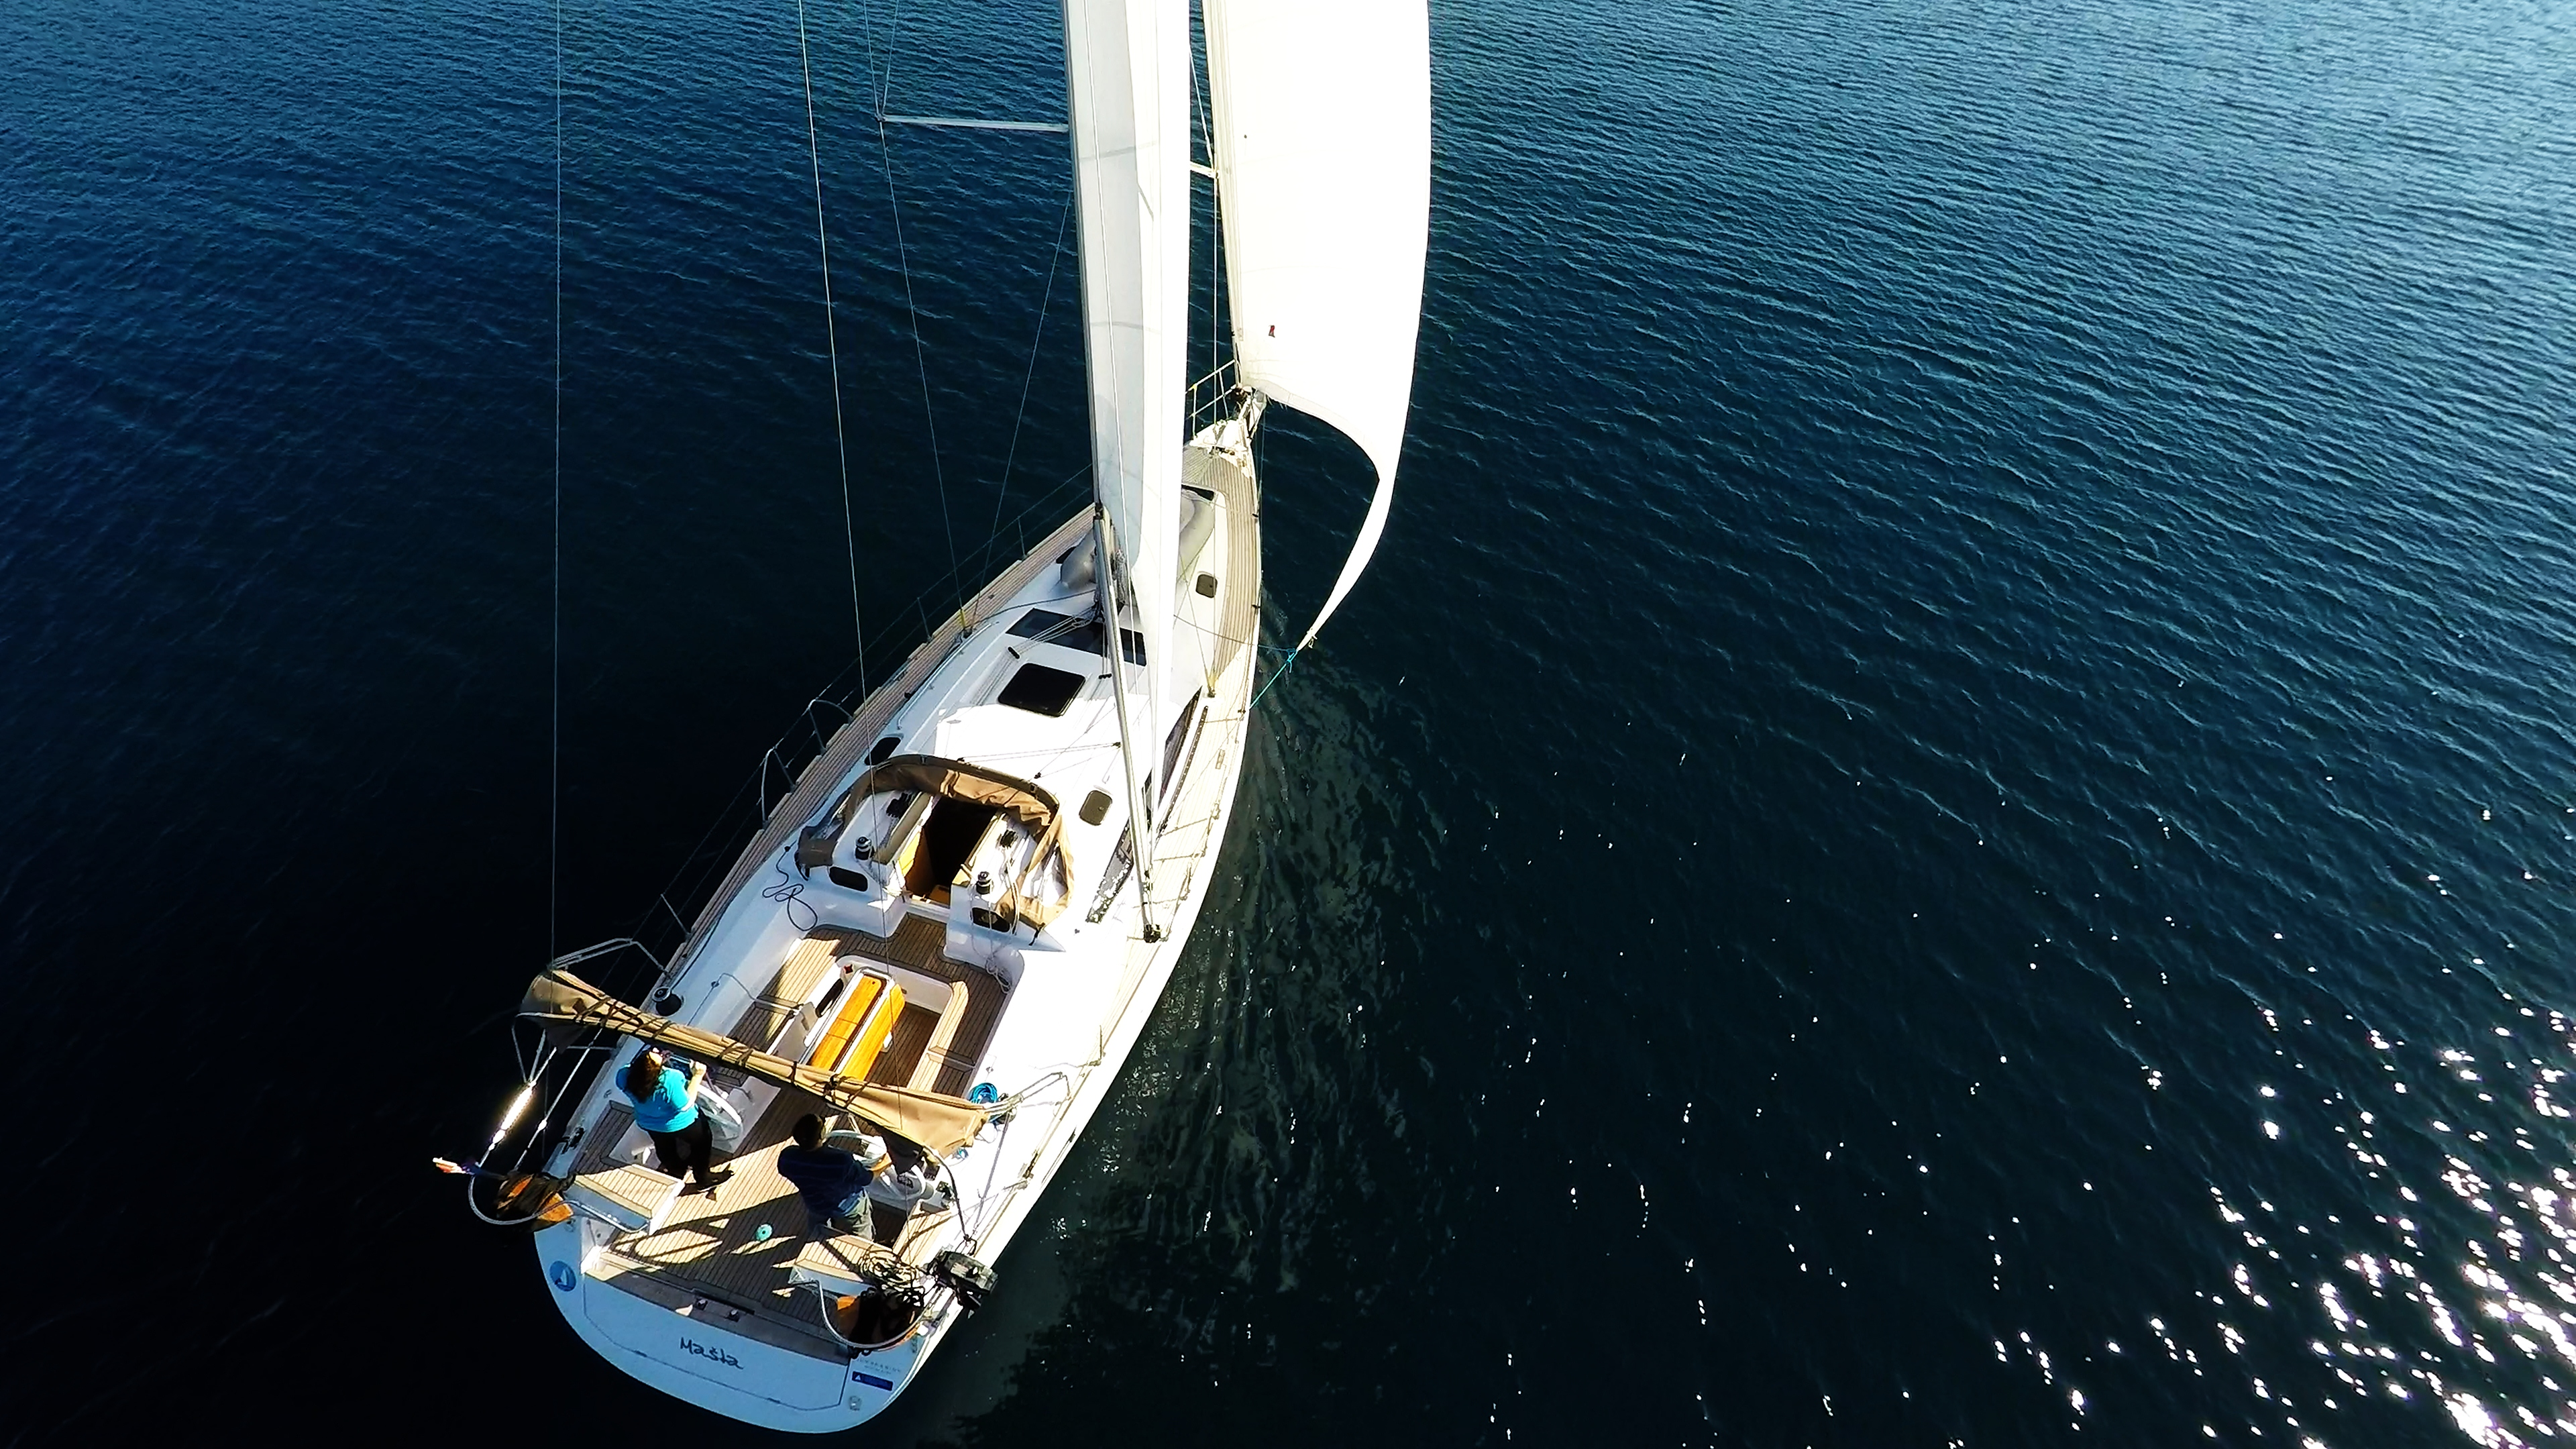 barcha a vela yacht a vela elan 45 impression pontein teak vele barca a vela sole